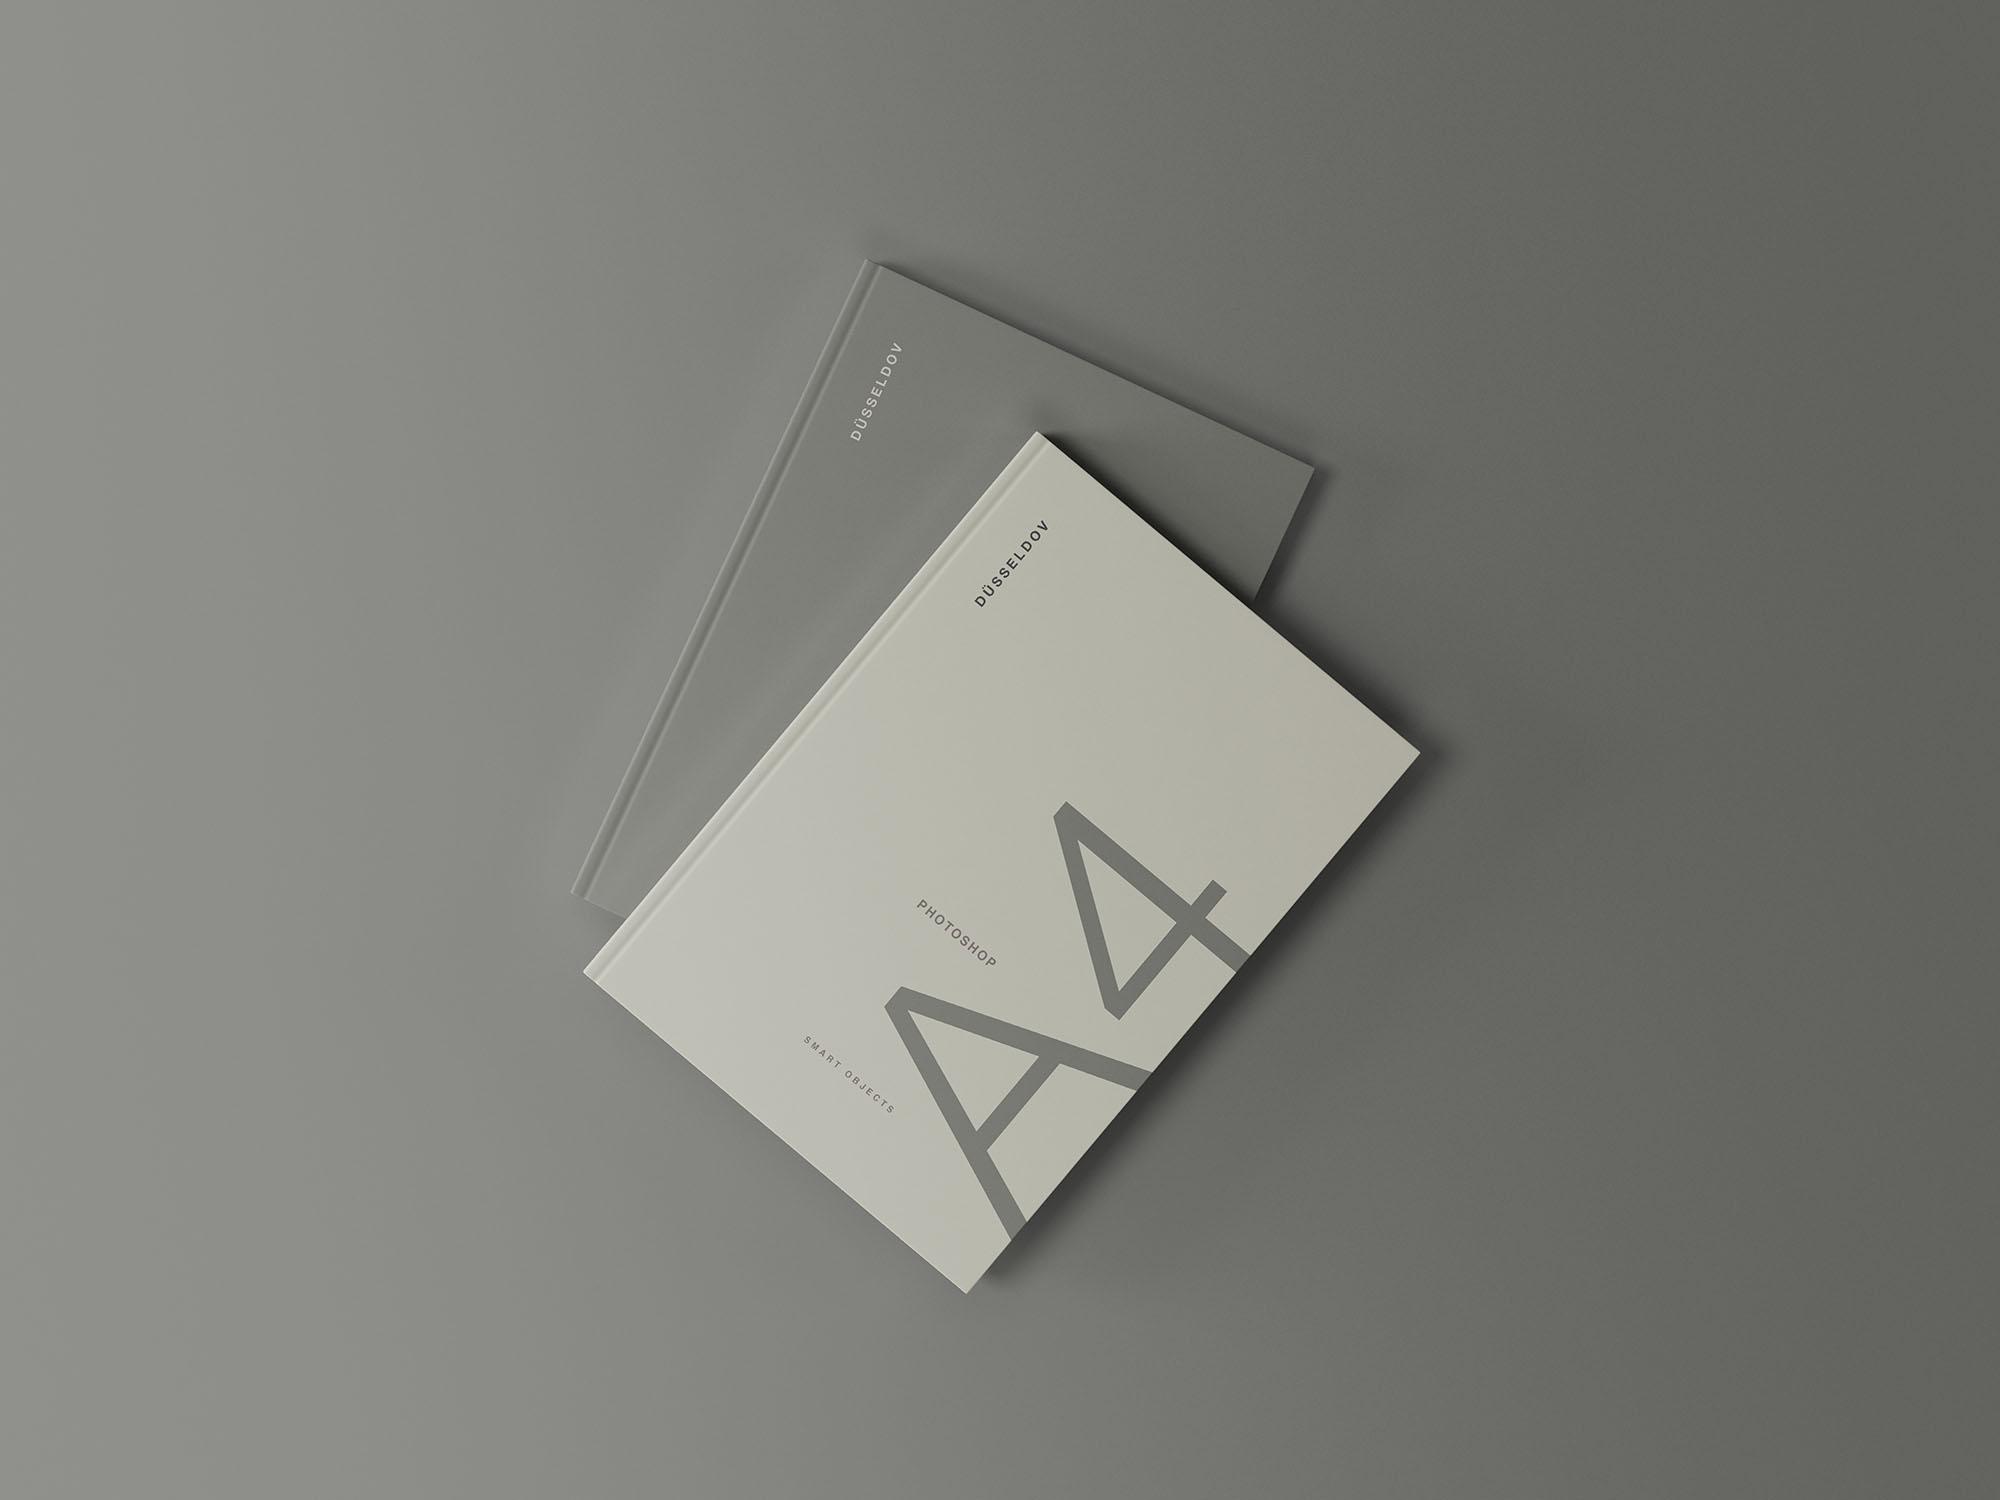 2 Hardcover Books Mockup